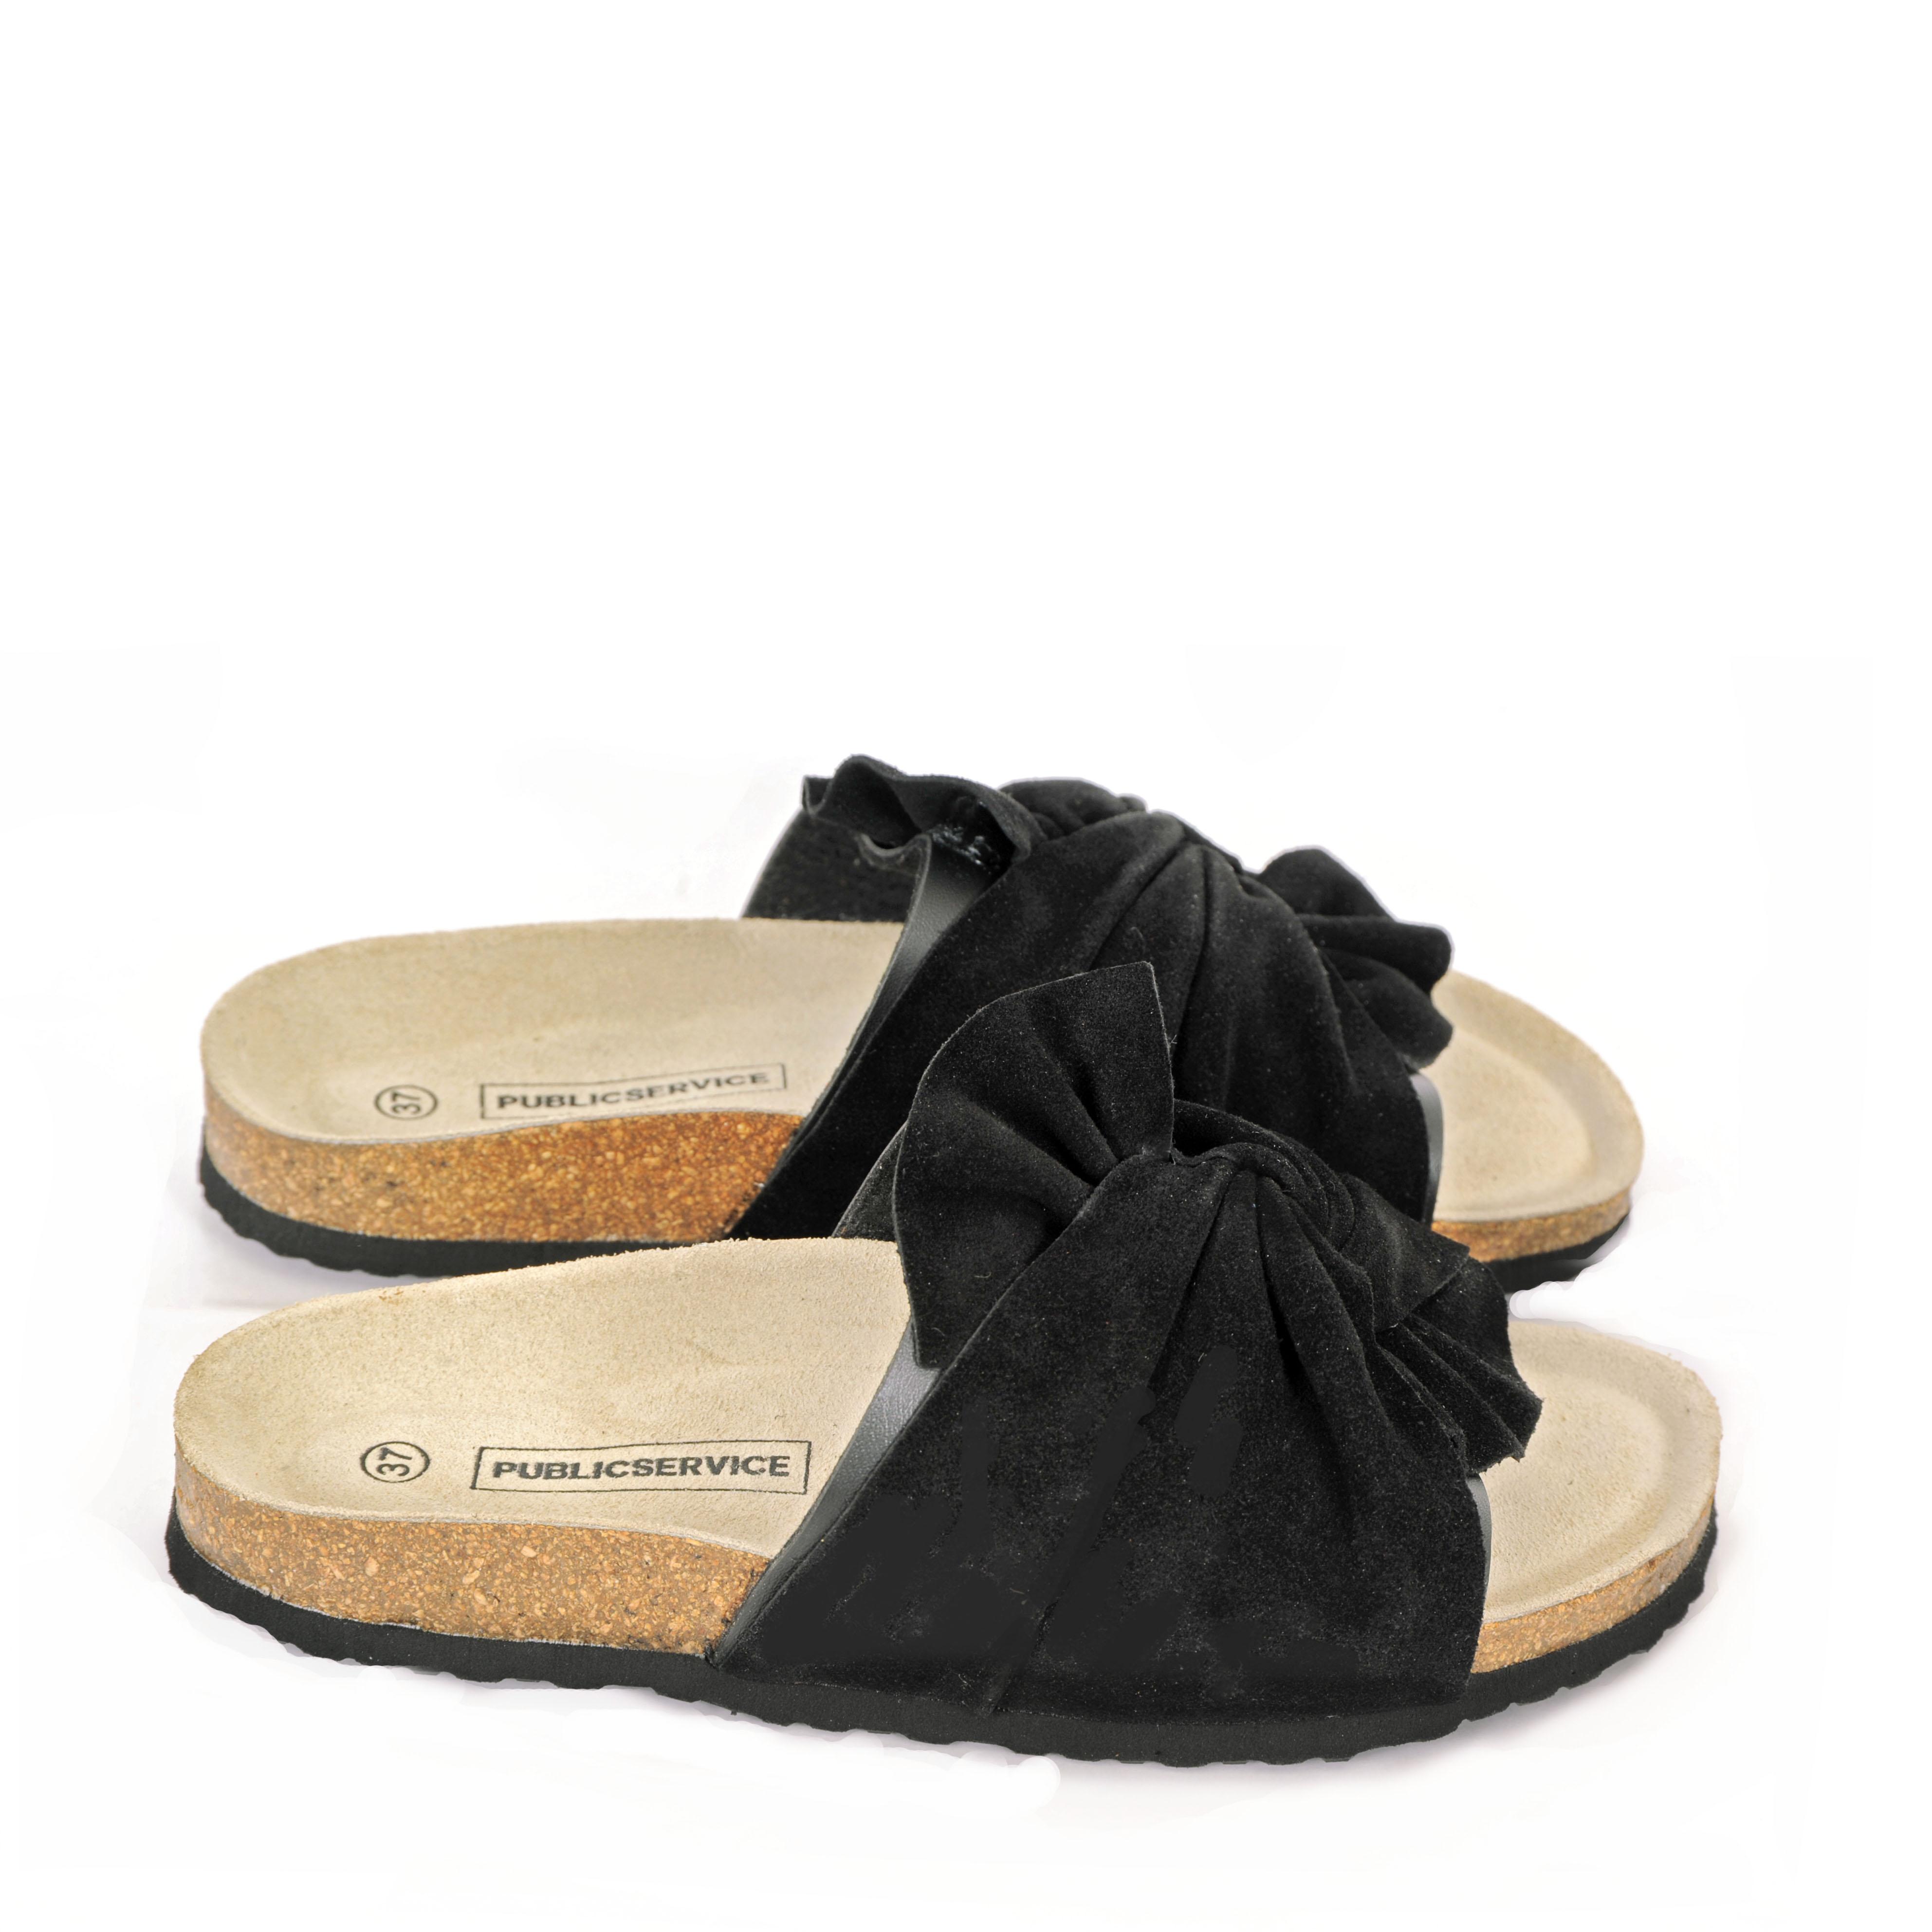 Maison Shoeshibar Aimee Sandal Black Mitt Skattekammer